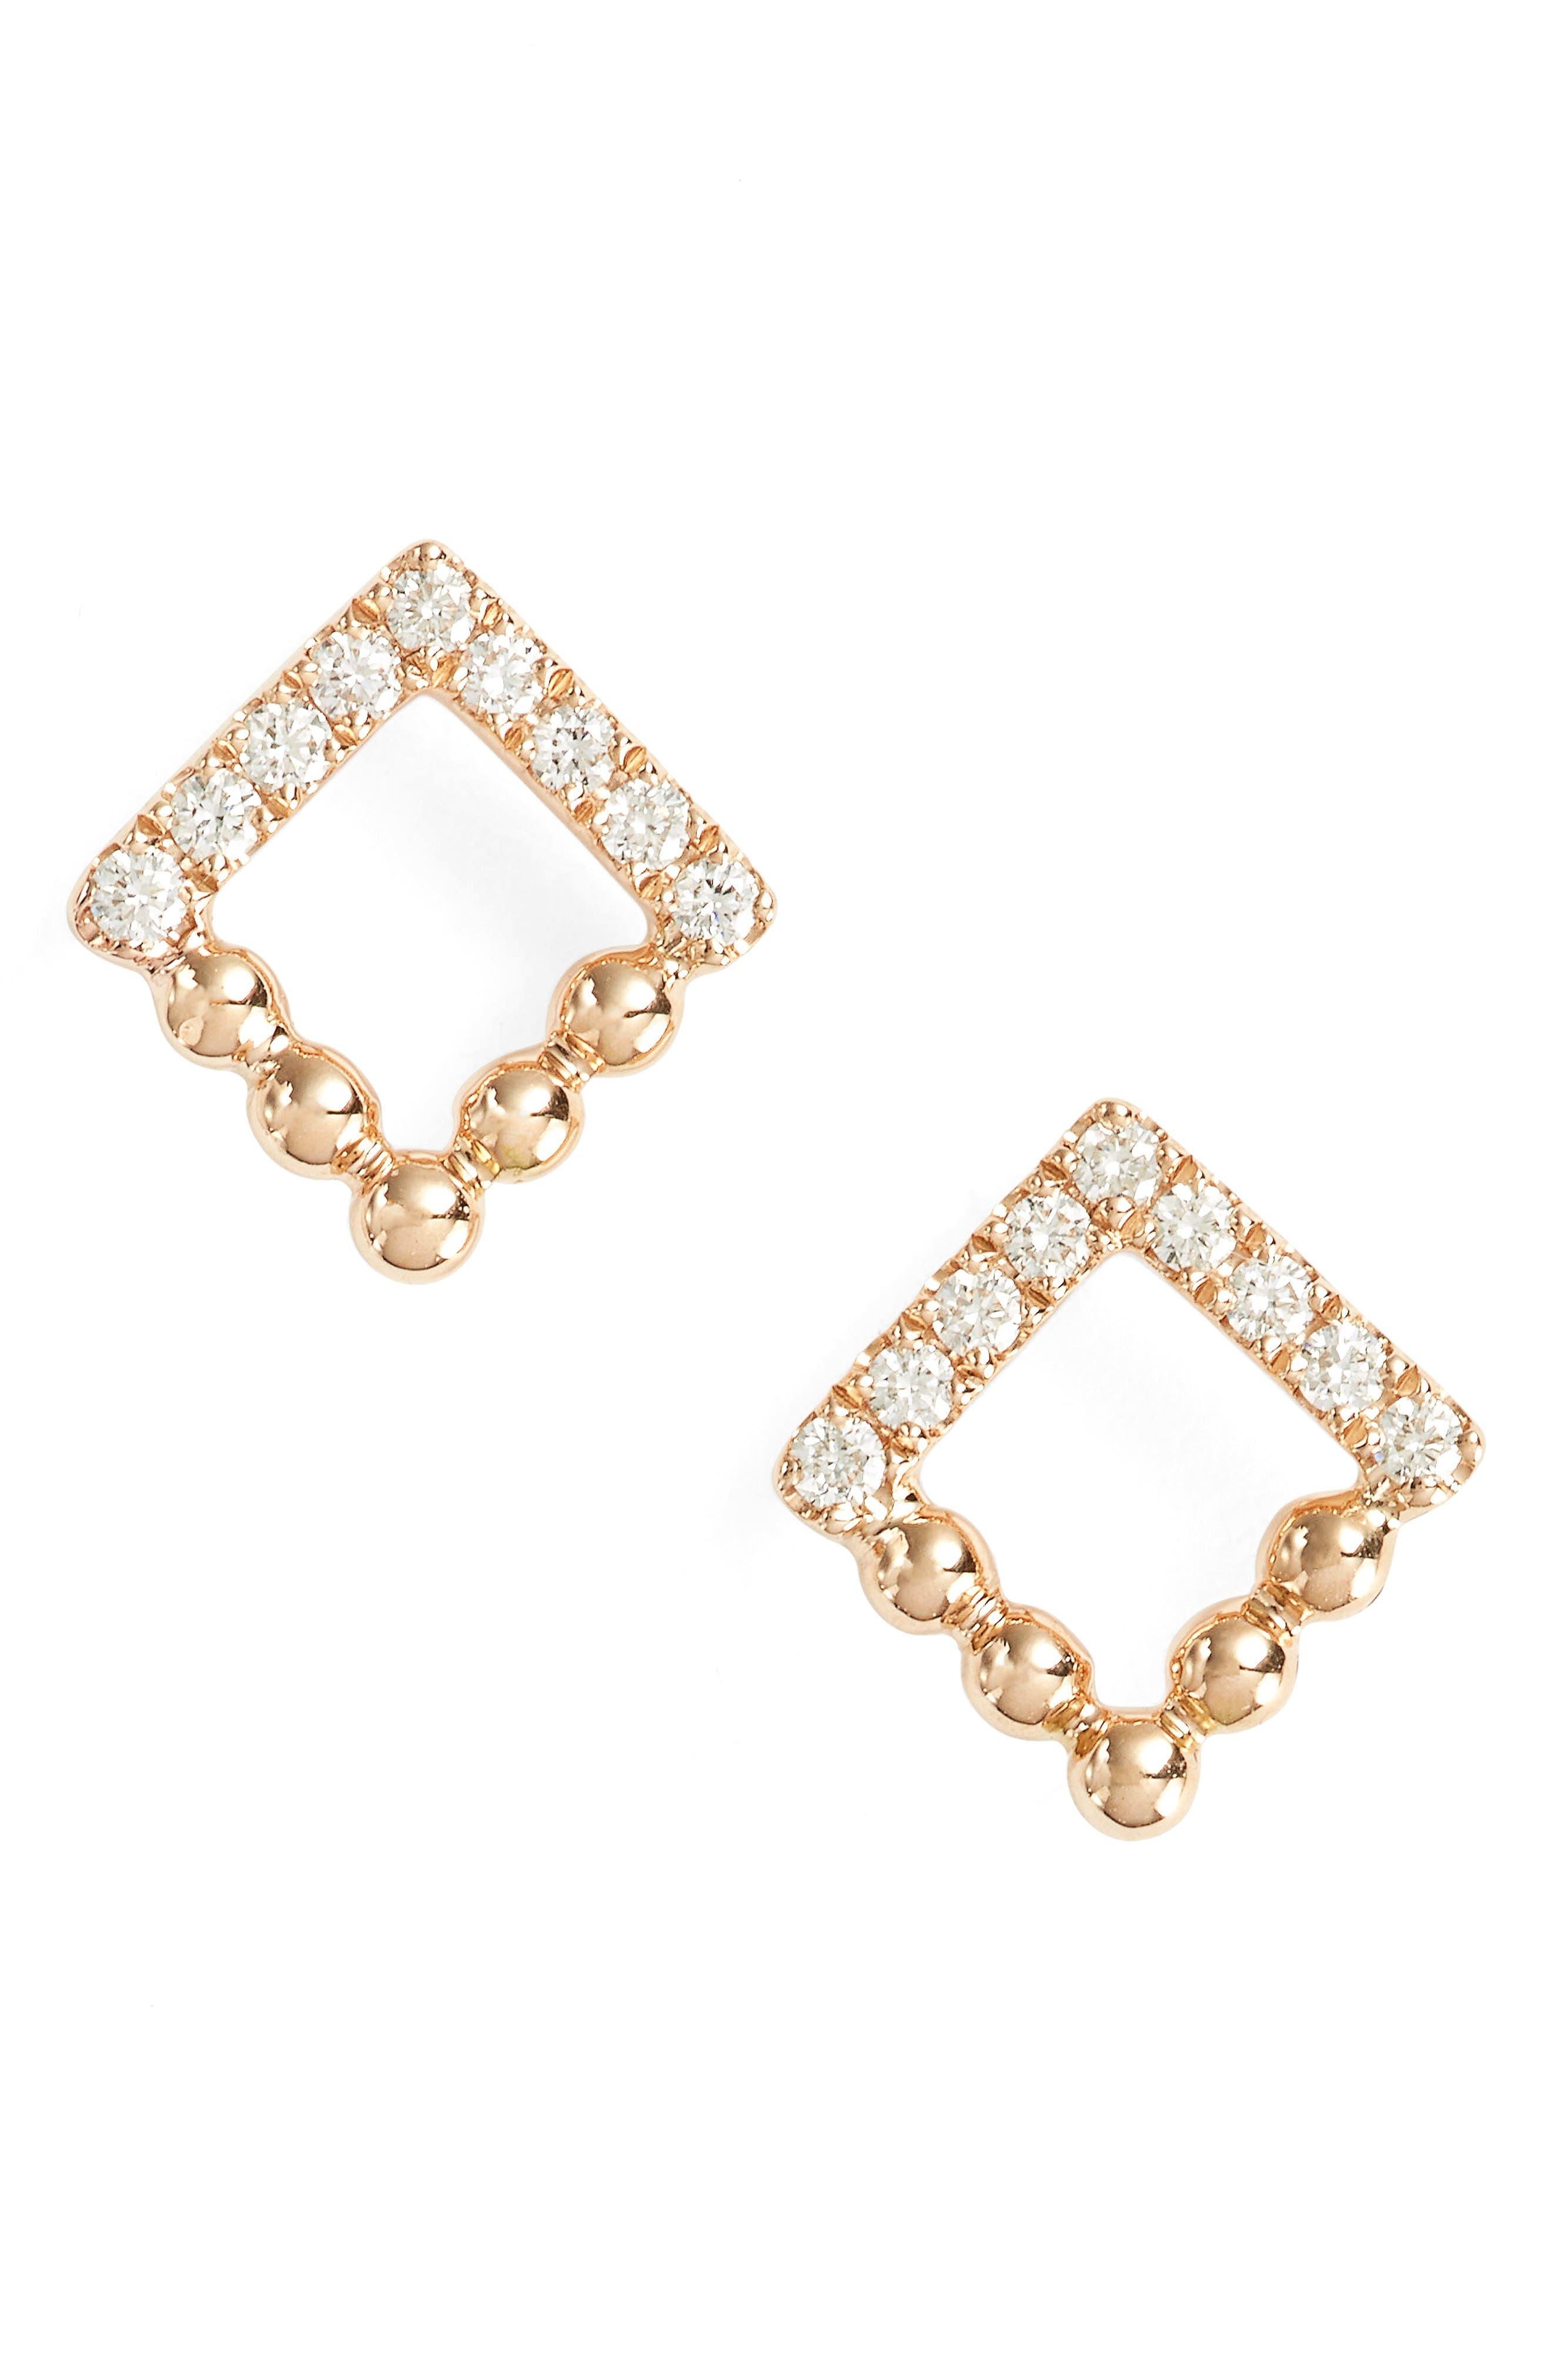 Main Image - Dana Rebecca Designs Poppy Rae Square Diamond Stud Earrings